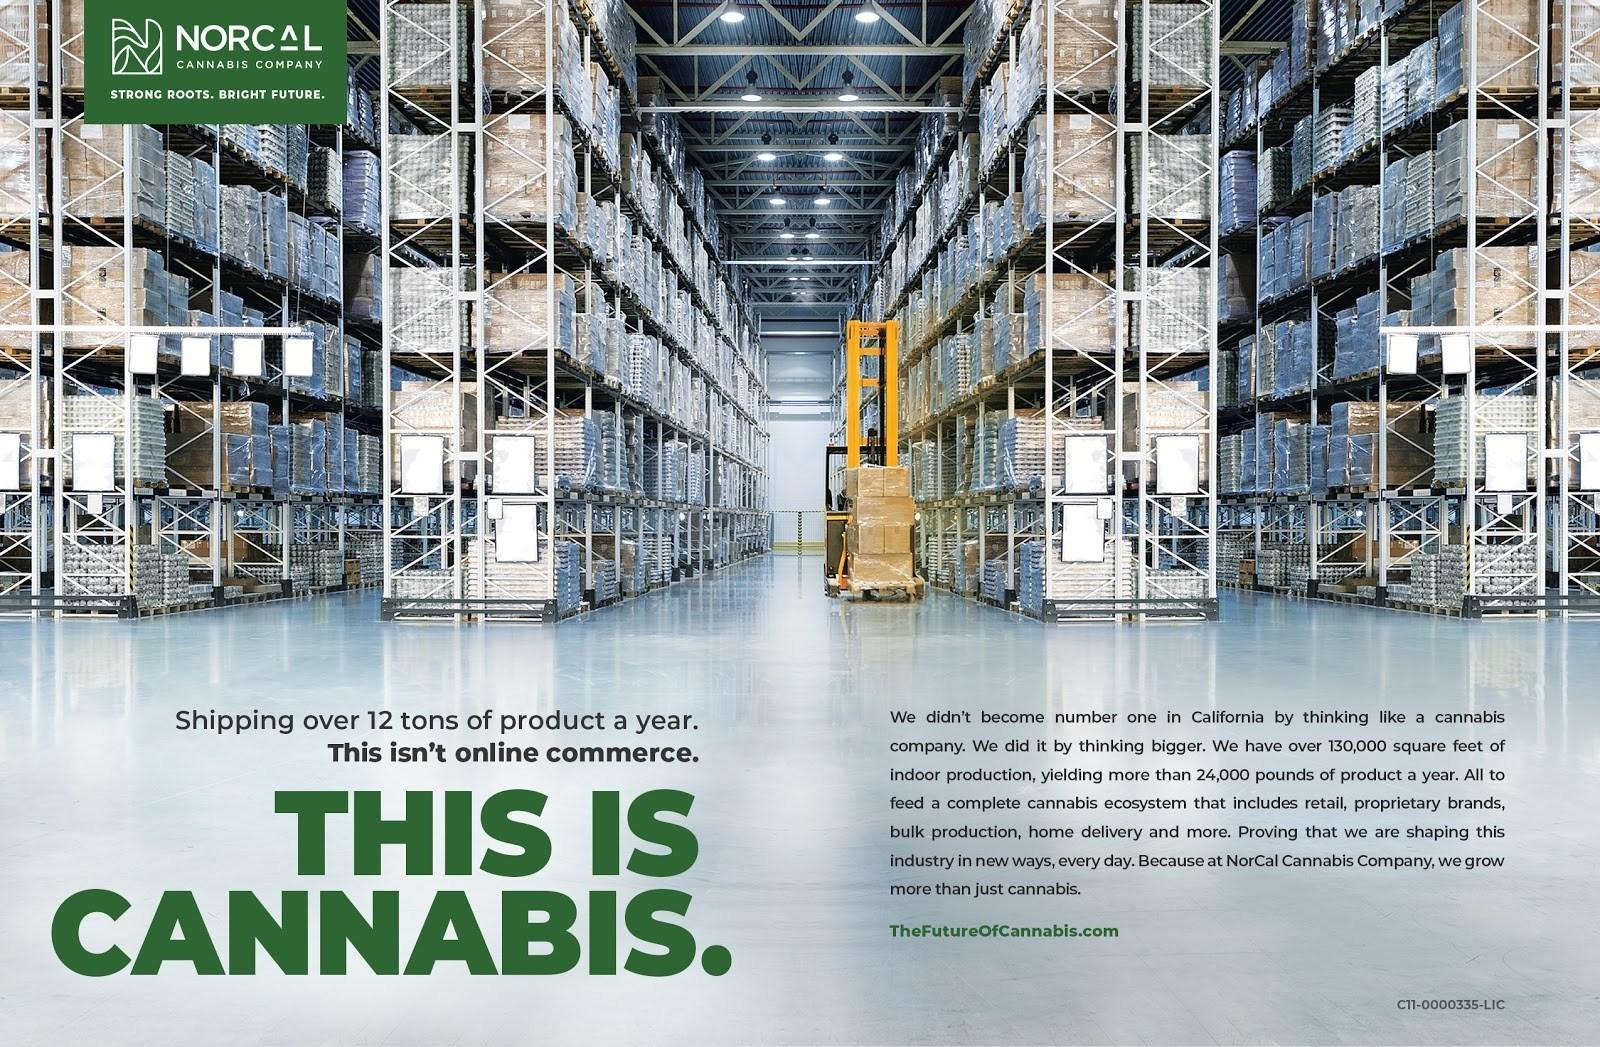 NorCal Cannabis - Educating Investors, Consumers Alike: NorCal's CMO Talks Cannabis Marketing